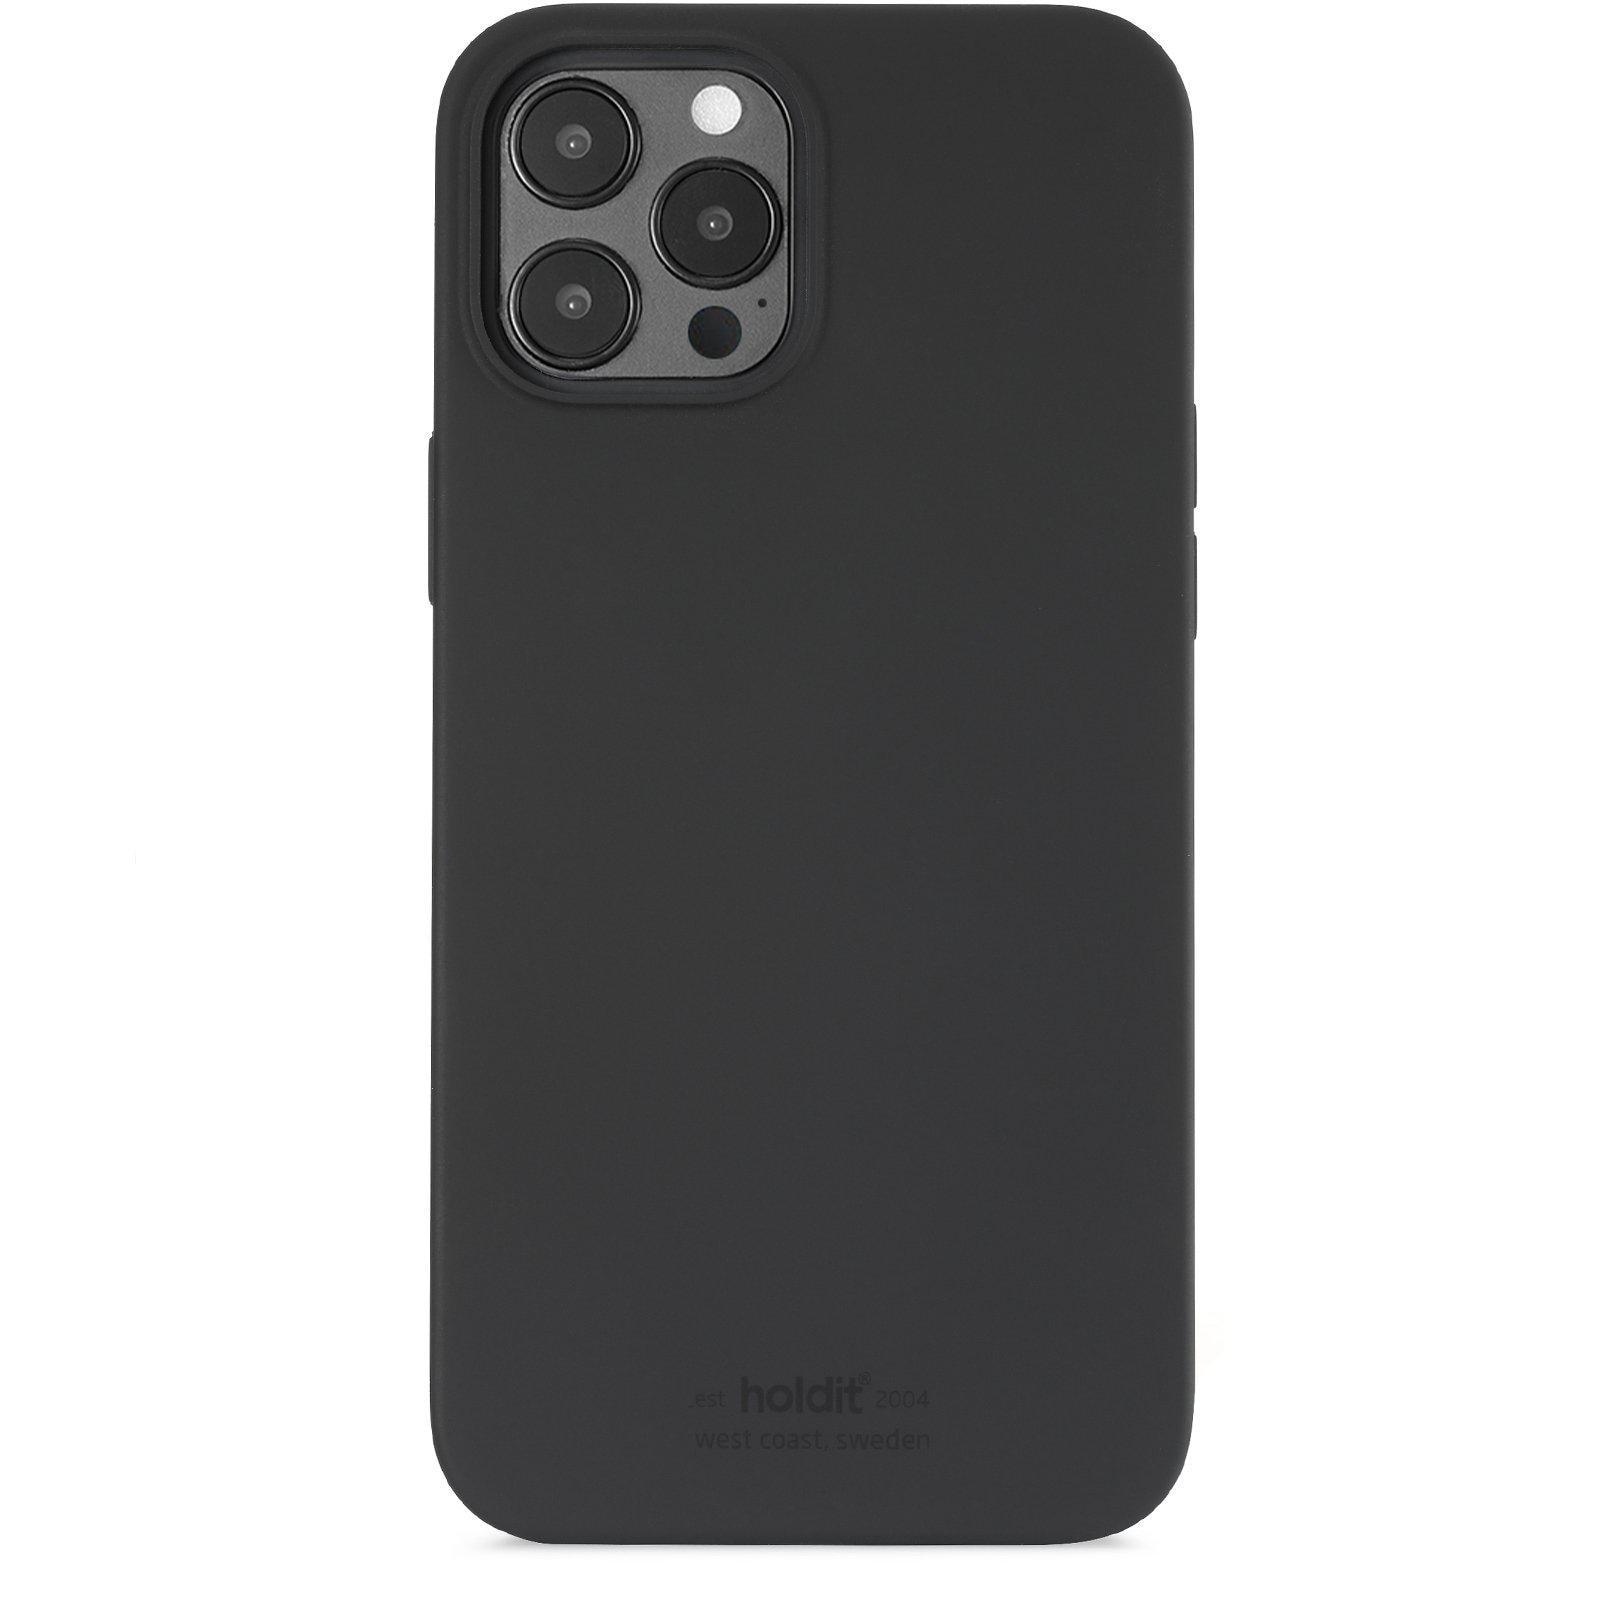 Silikonskal iPhone 12 Pro Max Black